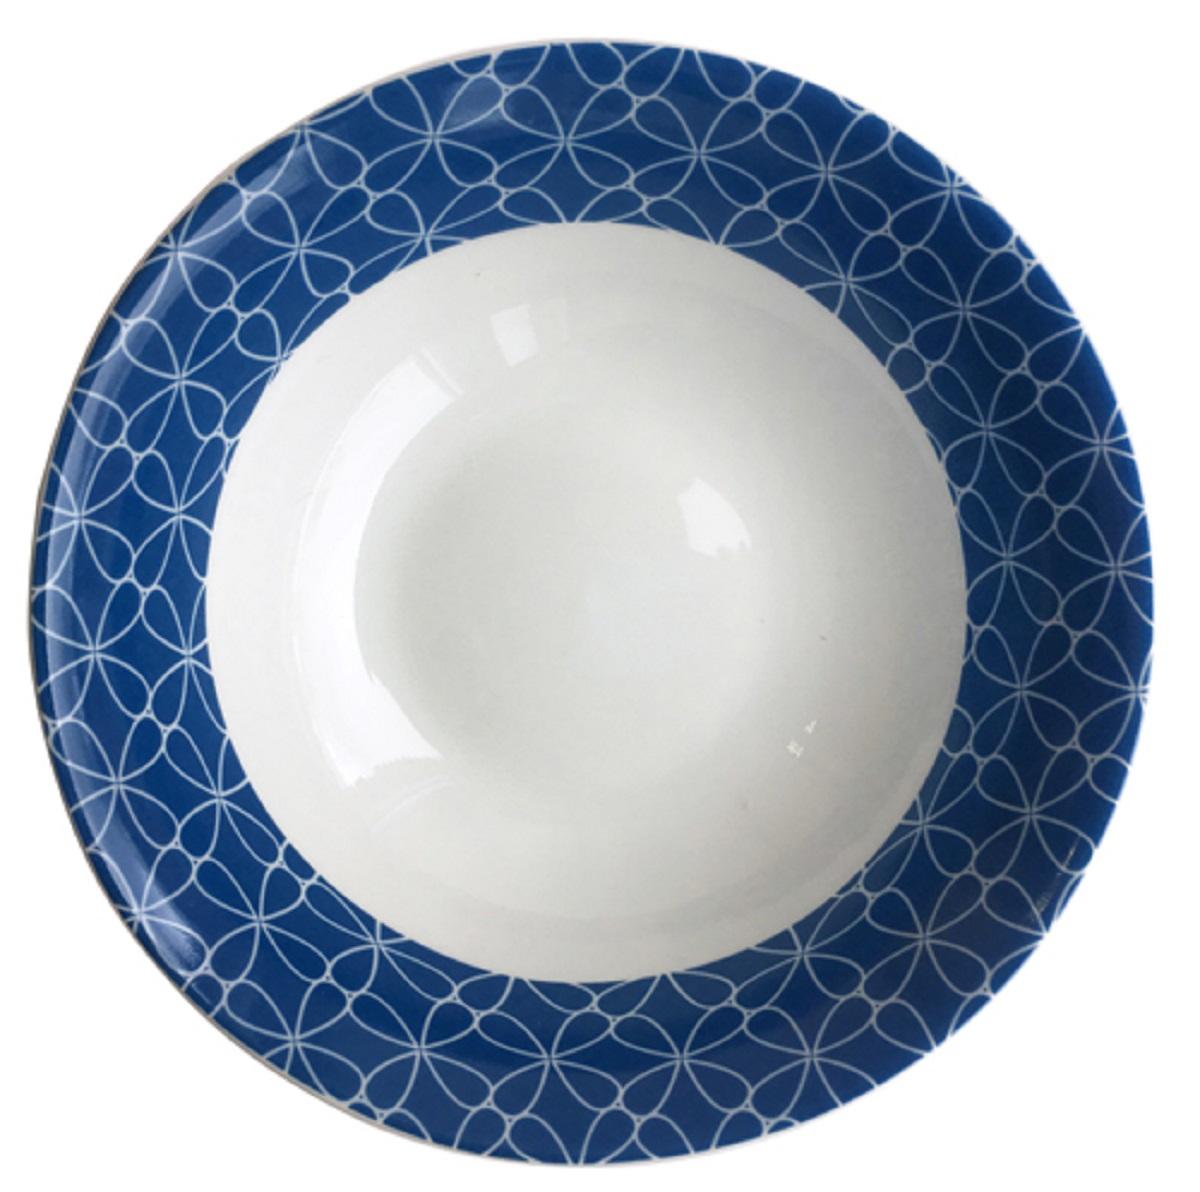 Салатник МФК-профит Белла, диаметр 15 см ложка кулинарная мфк профит comfort длина 32 см